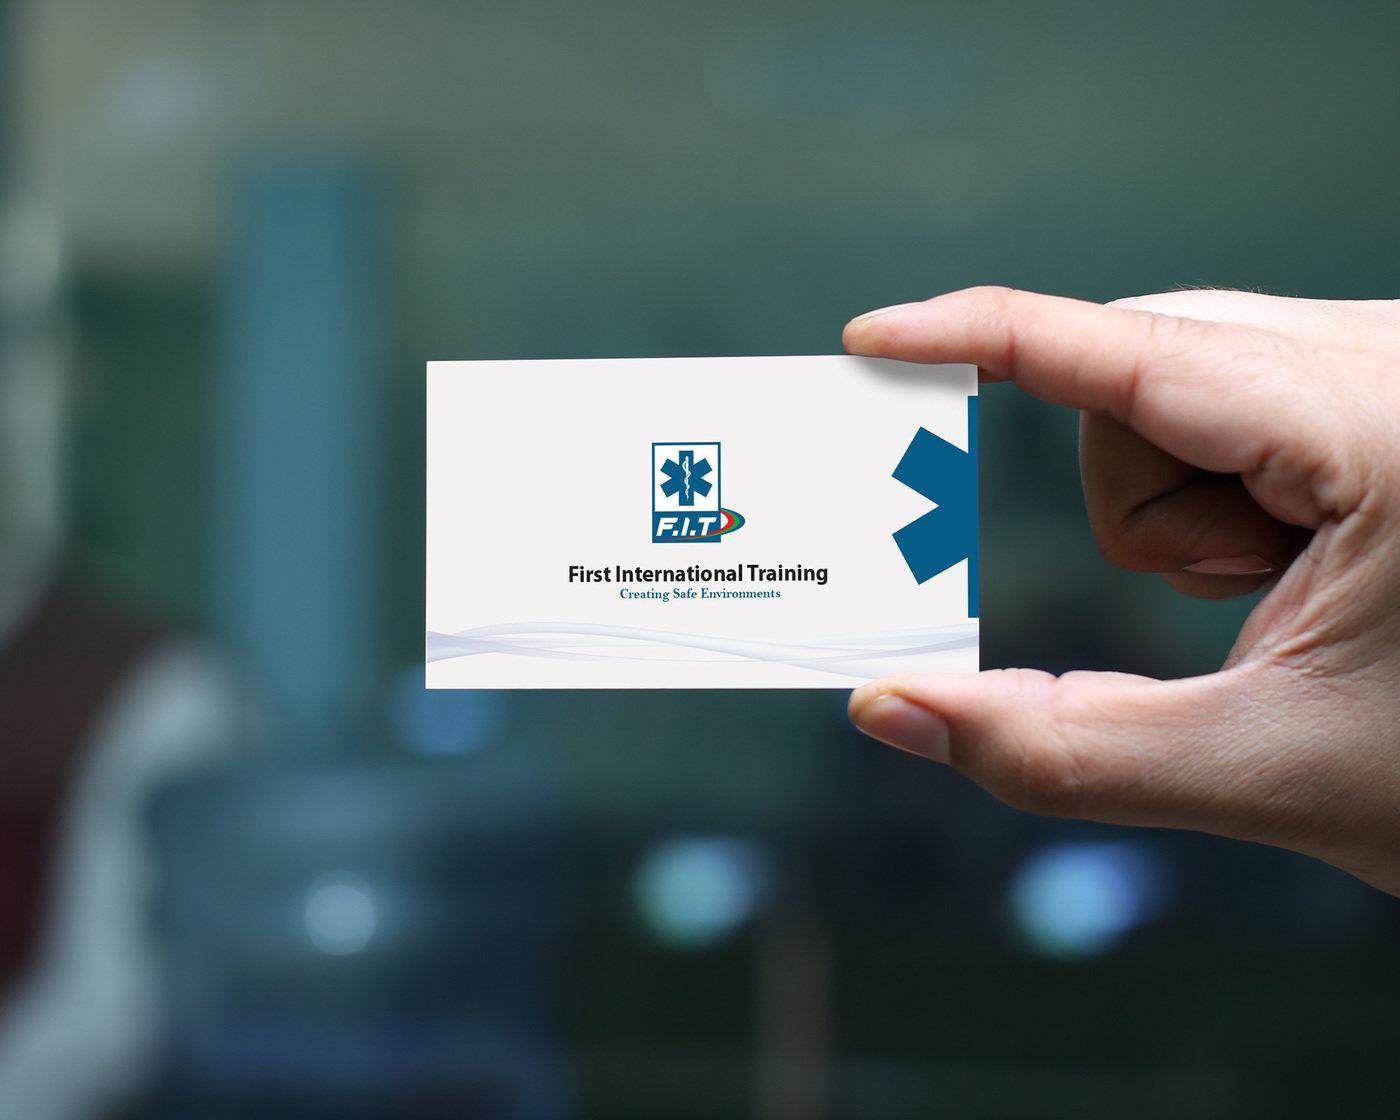 Business Cards by Shahwaiz Khan at Coroflot.com